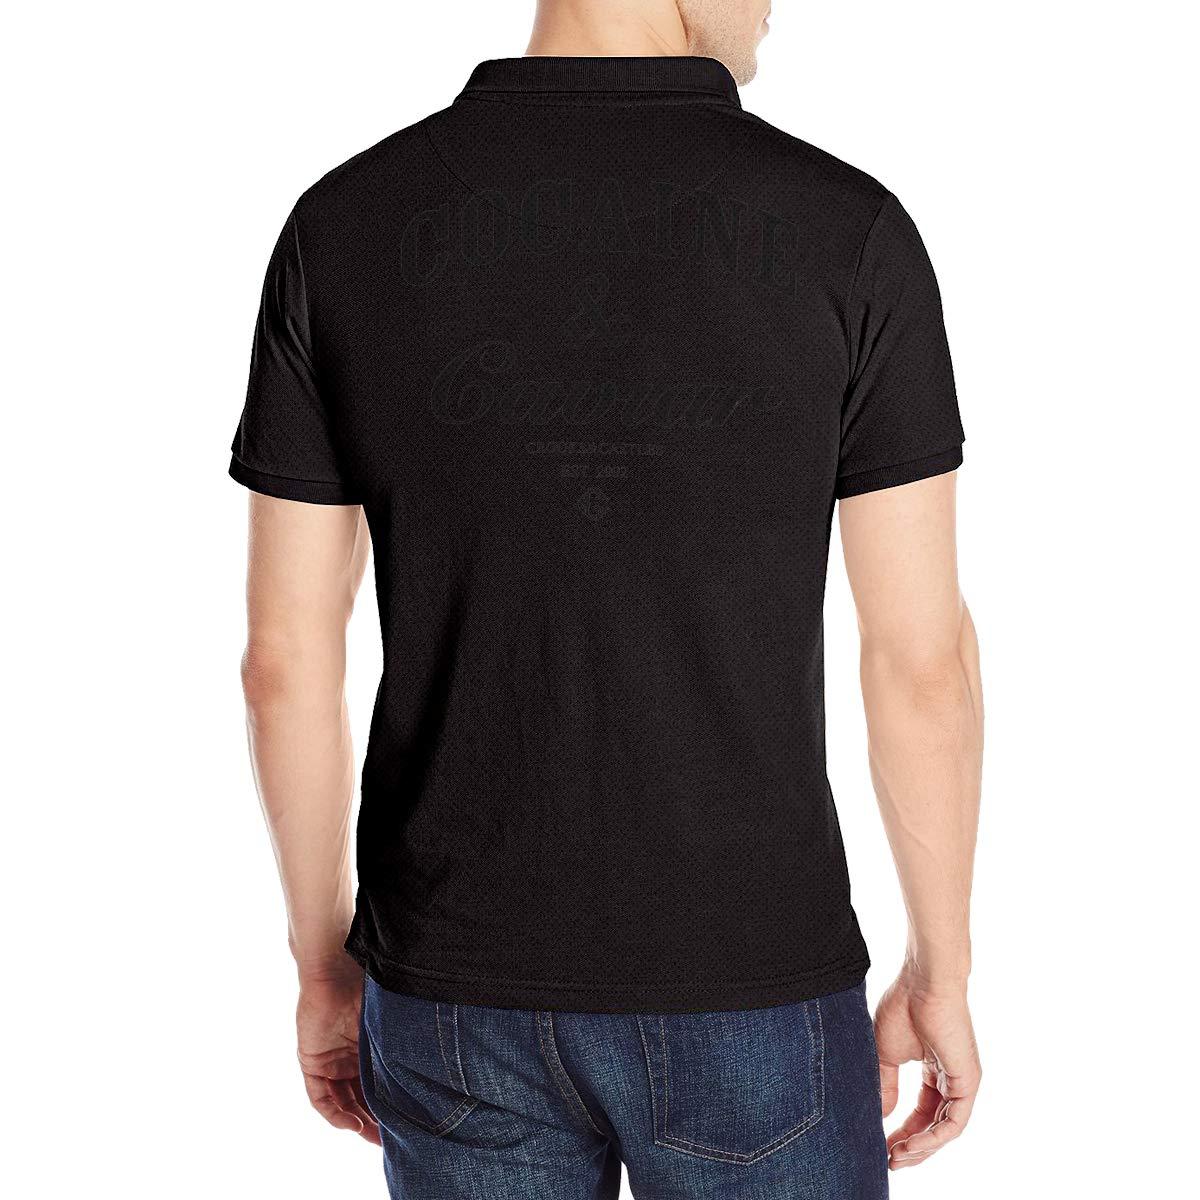 Arilce Cocaine Caviar Men Polo Shirt Short Sleeve Lapel Blouse Black